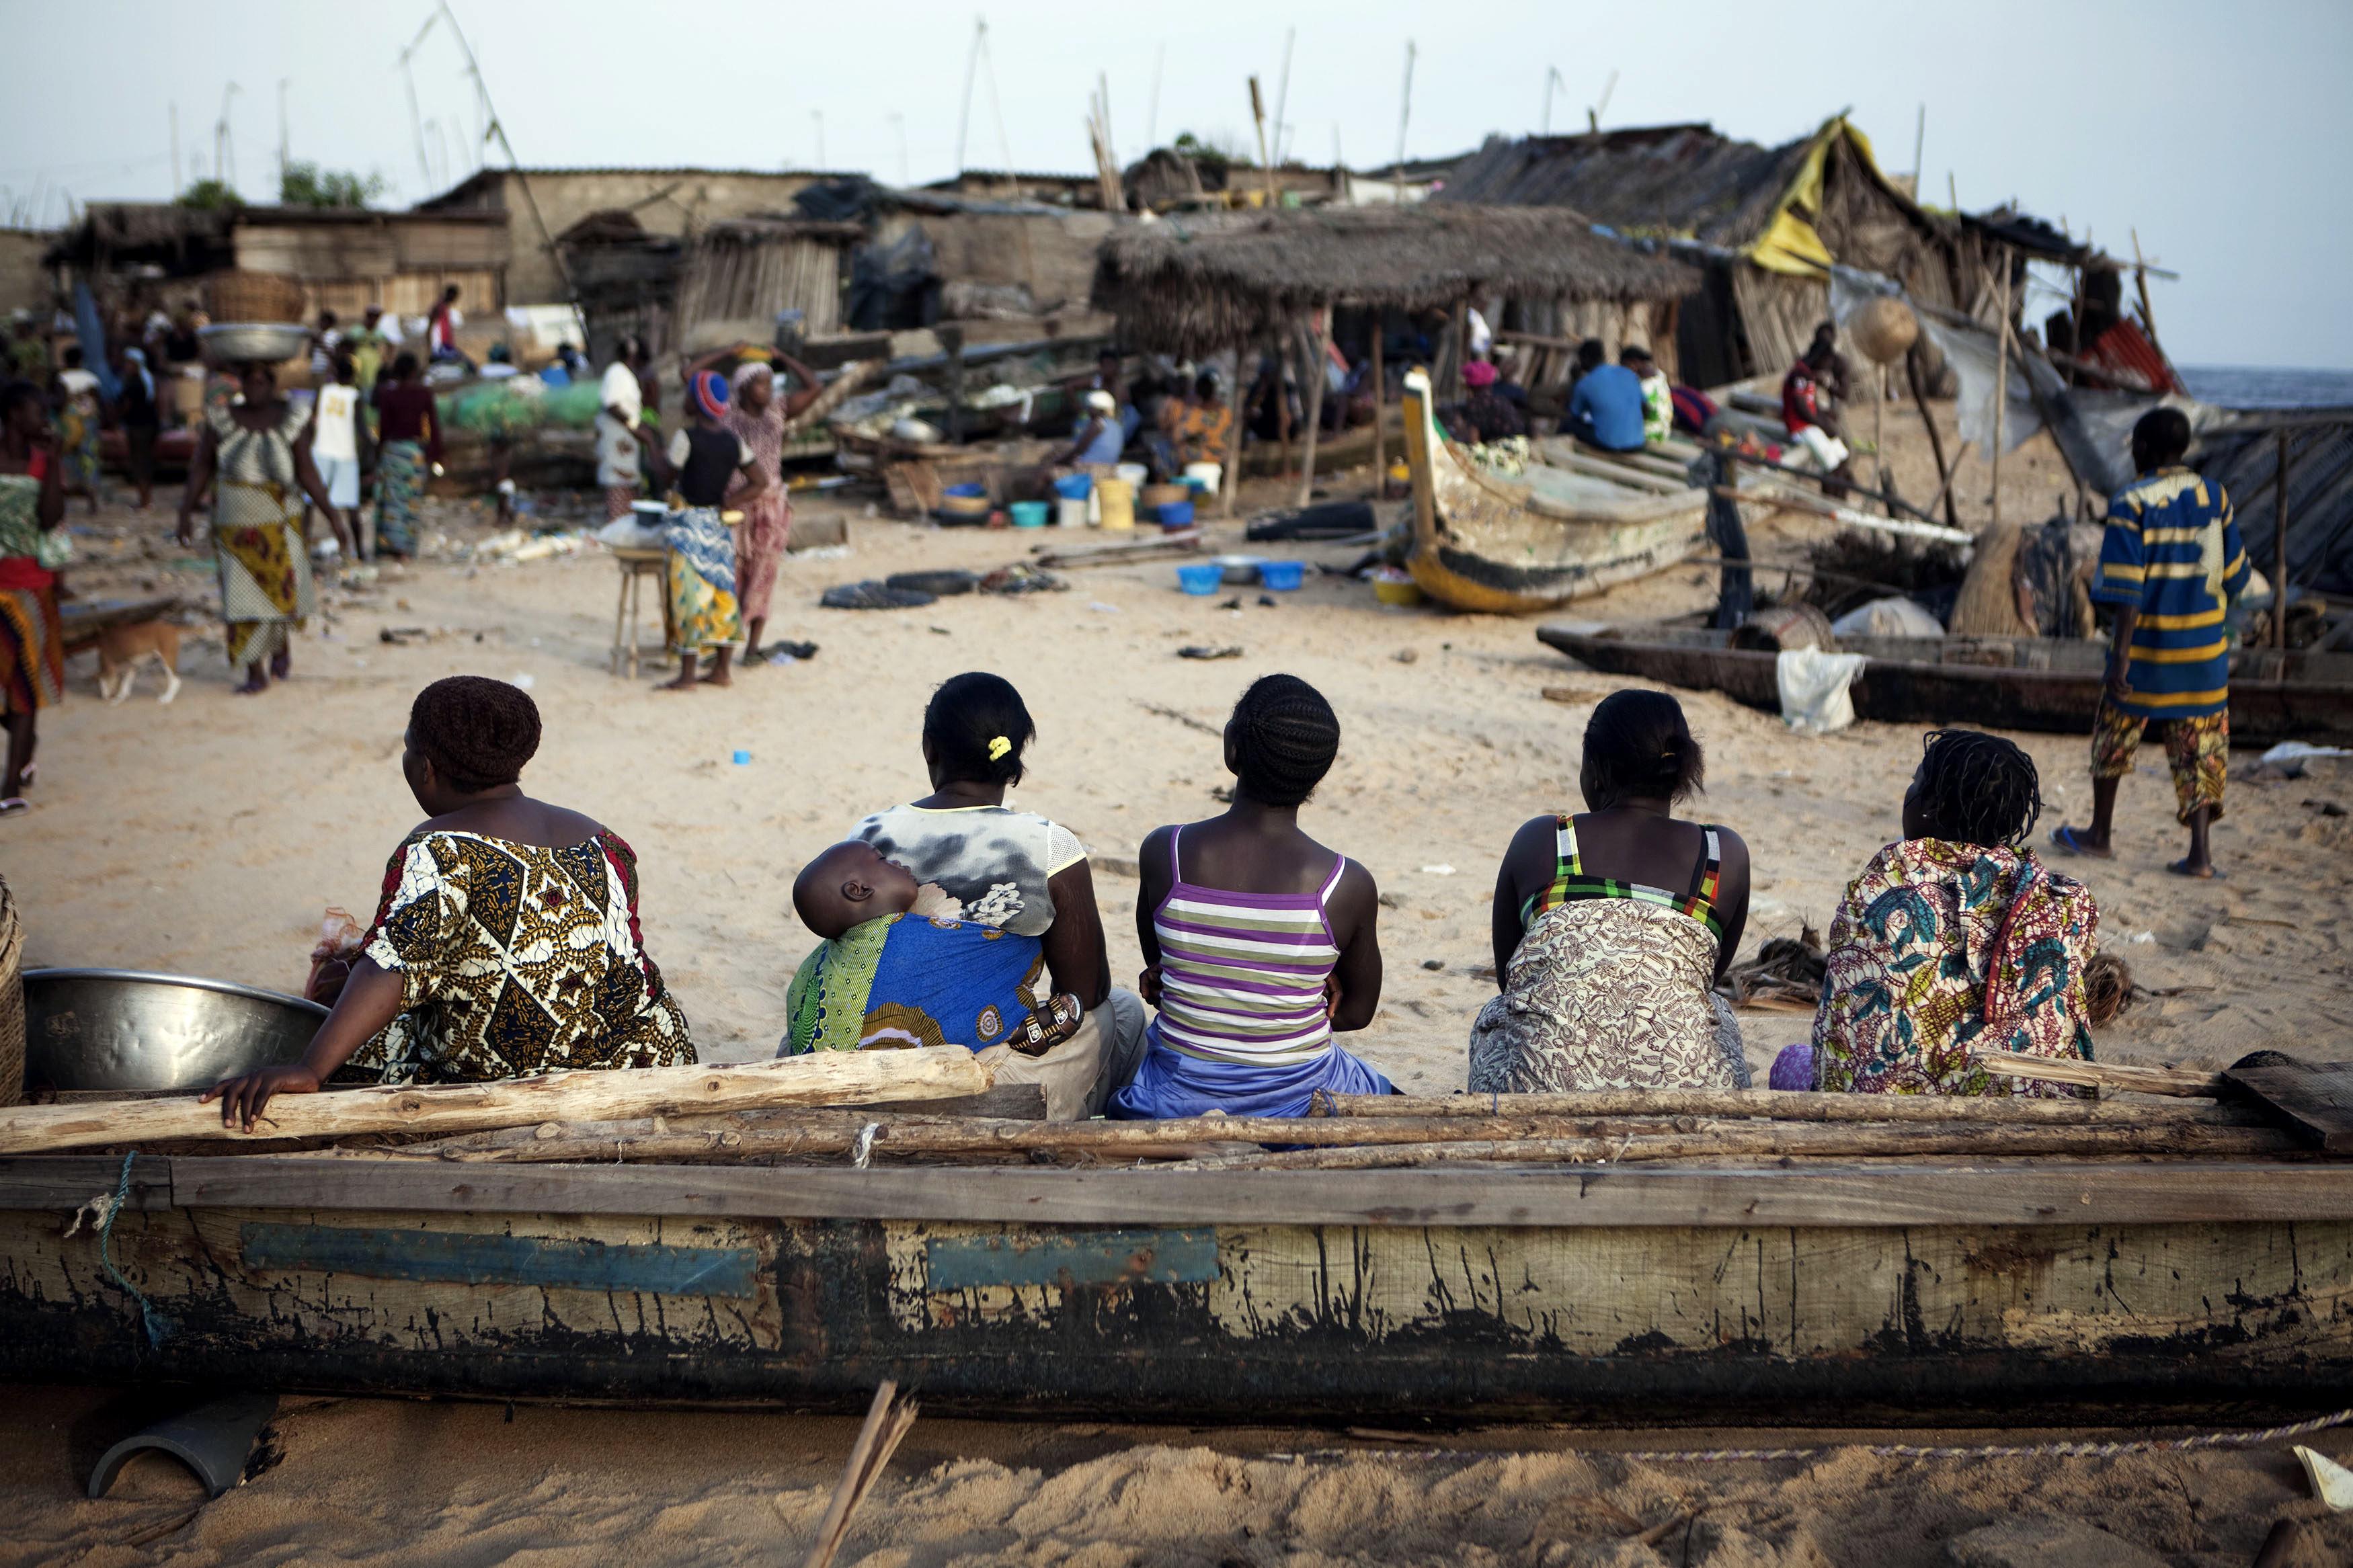 Women sit on a fishing boat in the Akpakpa neighbourhood of Benin's capital Cotonou